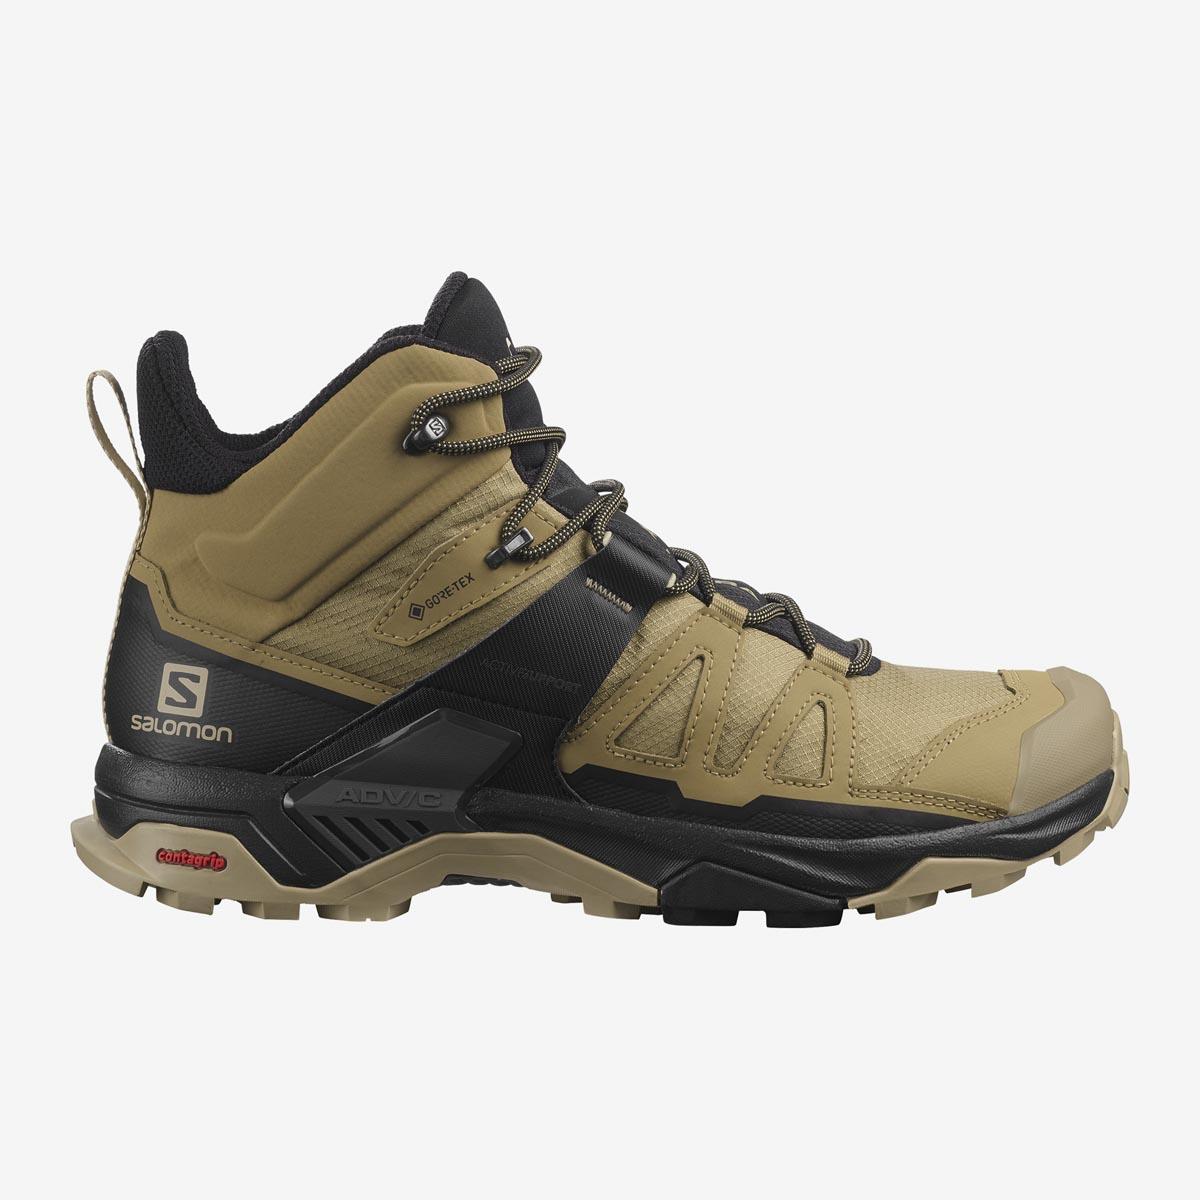 Ботинки X ULTRA 4 MID GTX